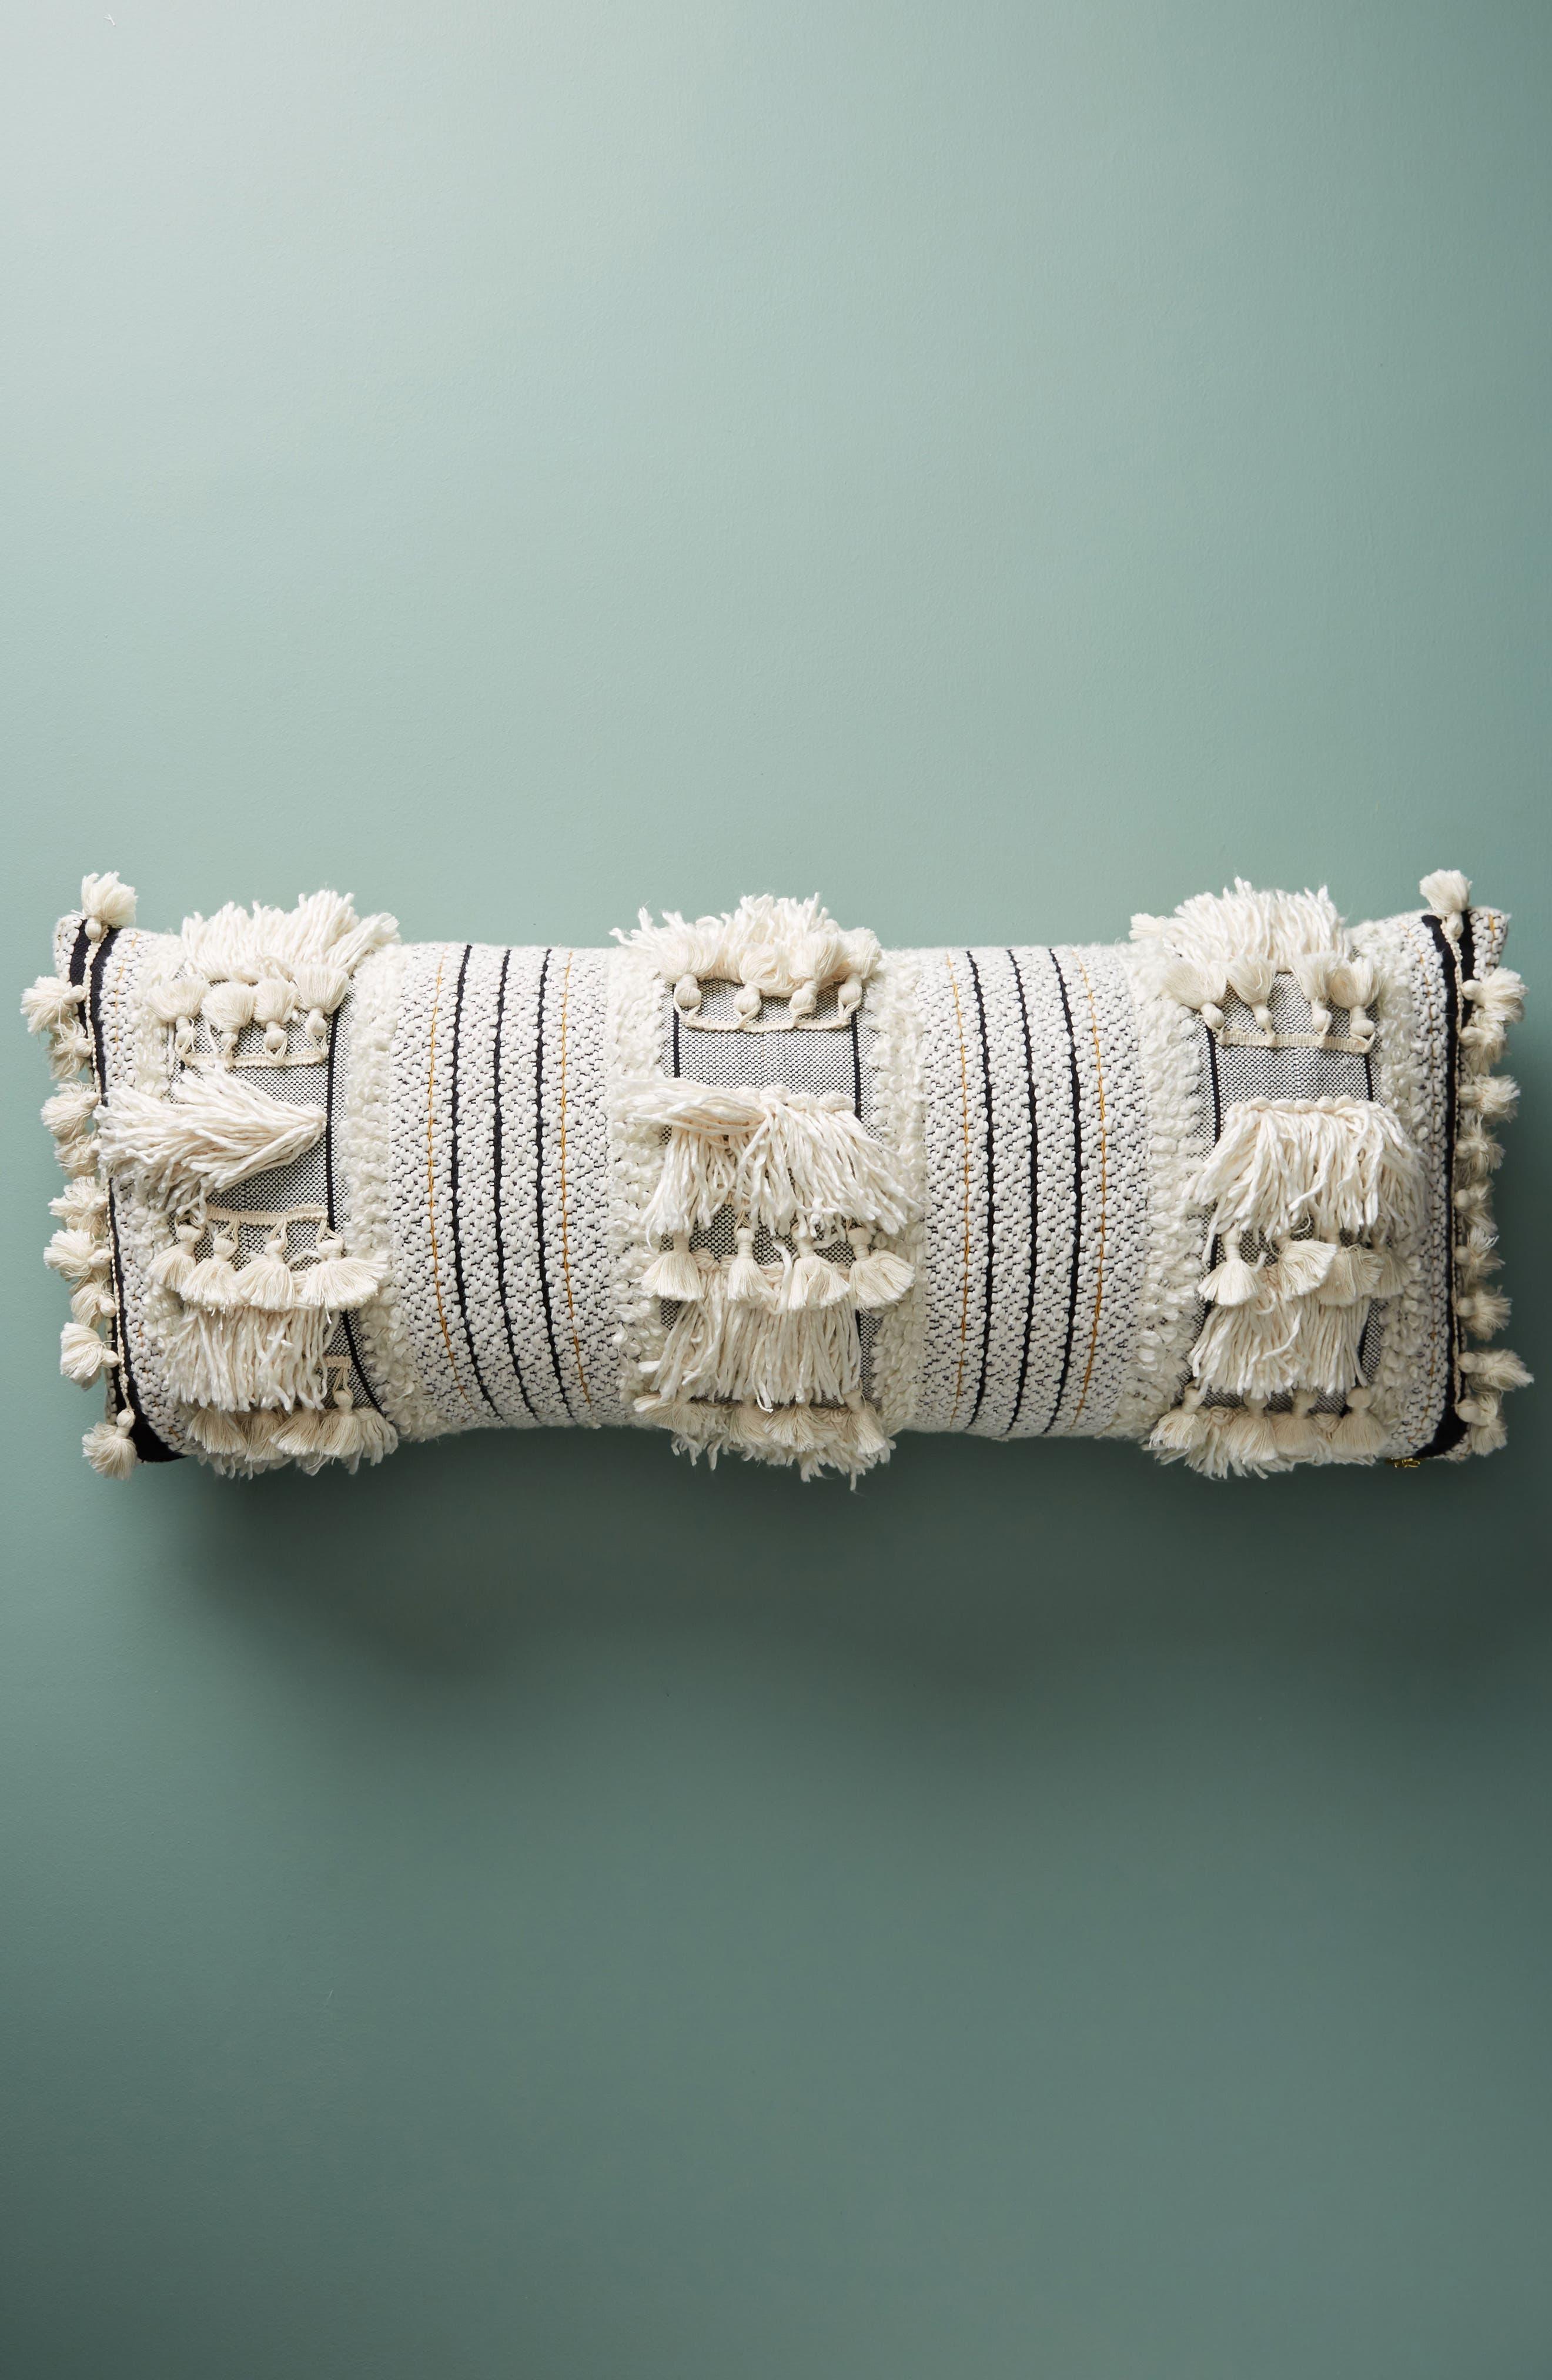 Edna Woven Accent Pillow,                             Main thumbnail 1, color,                             Black/ White Combo